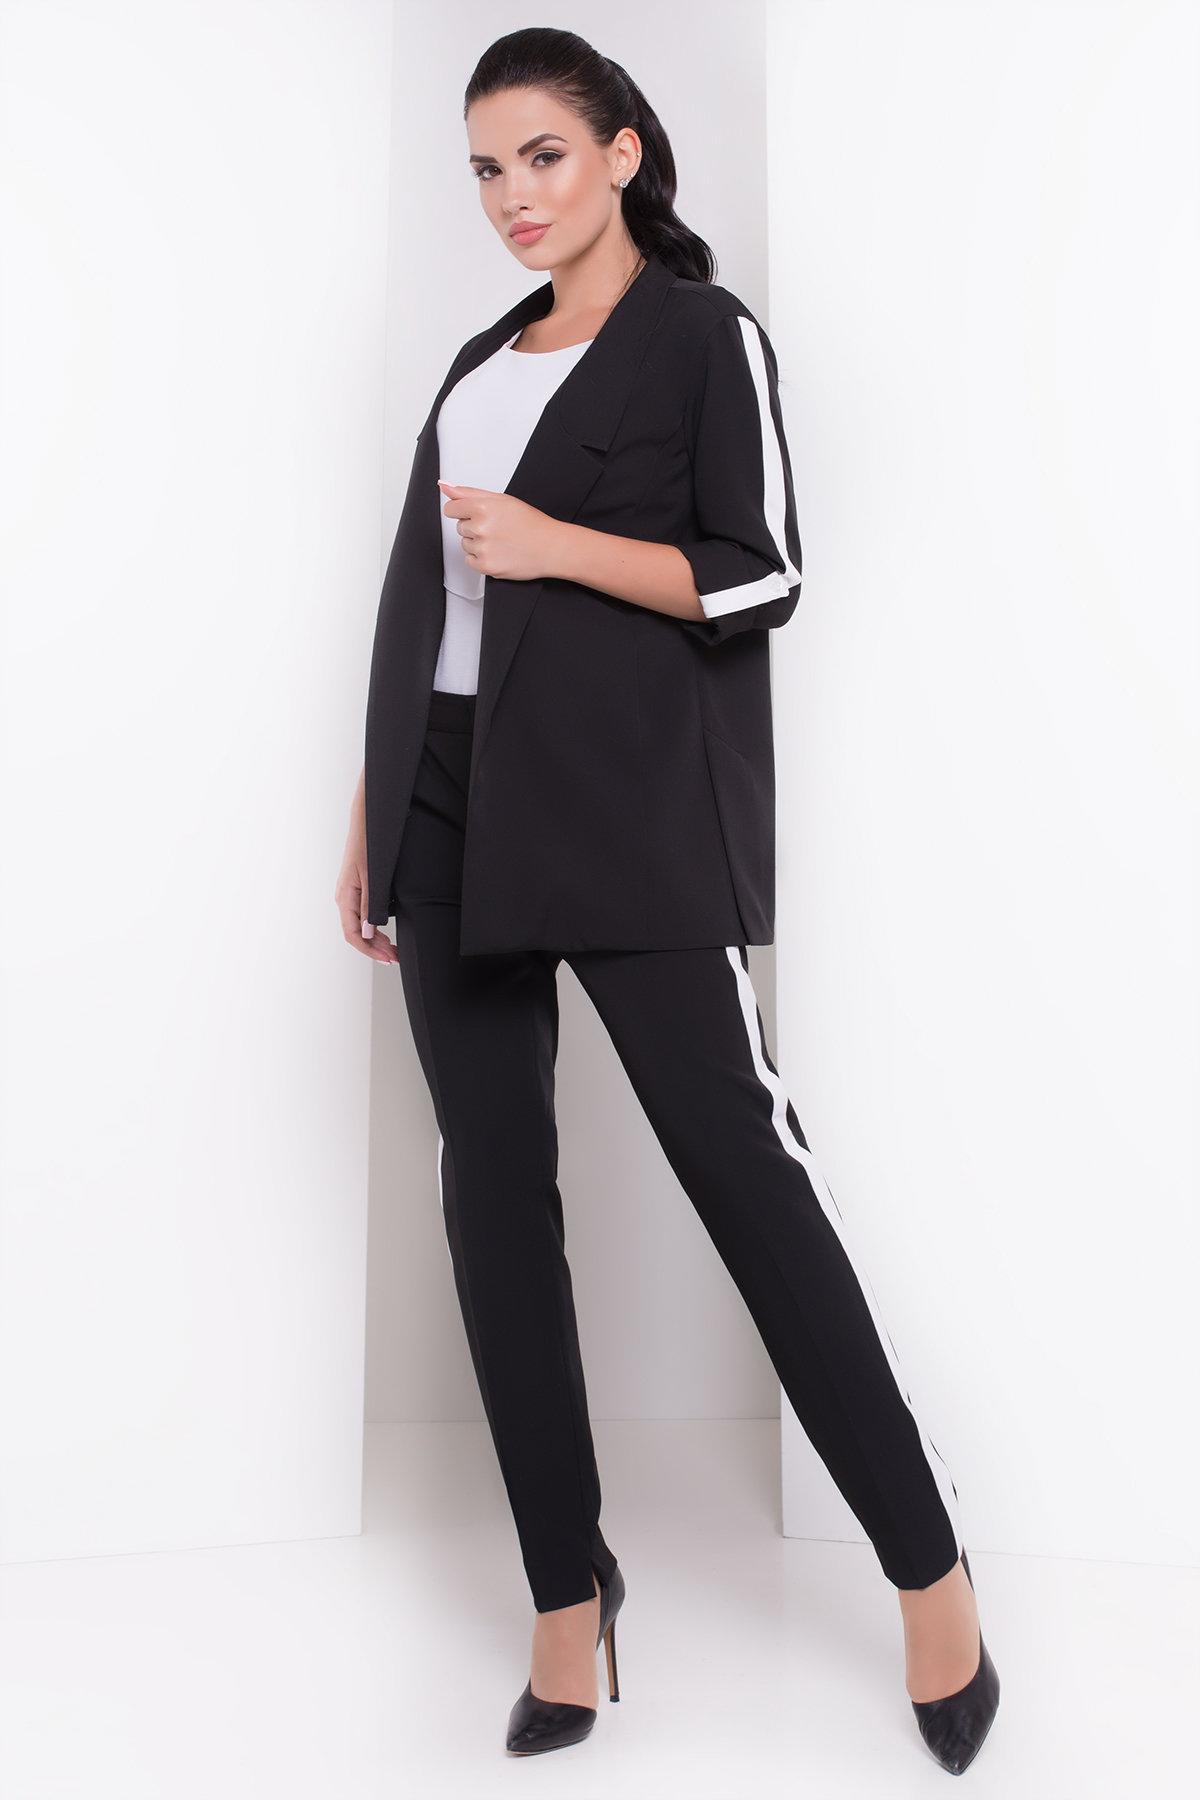 недорогие женские брюки Брюки Макеба 3247